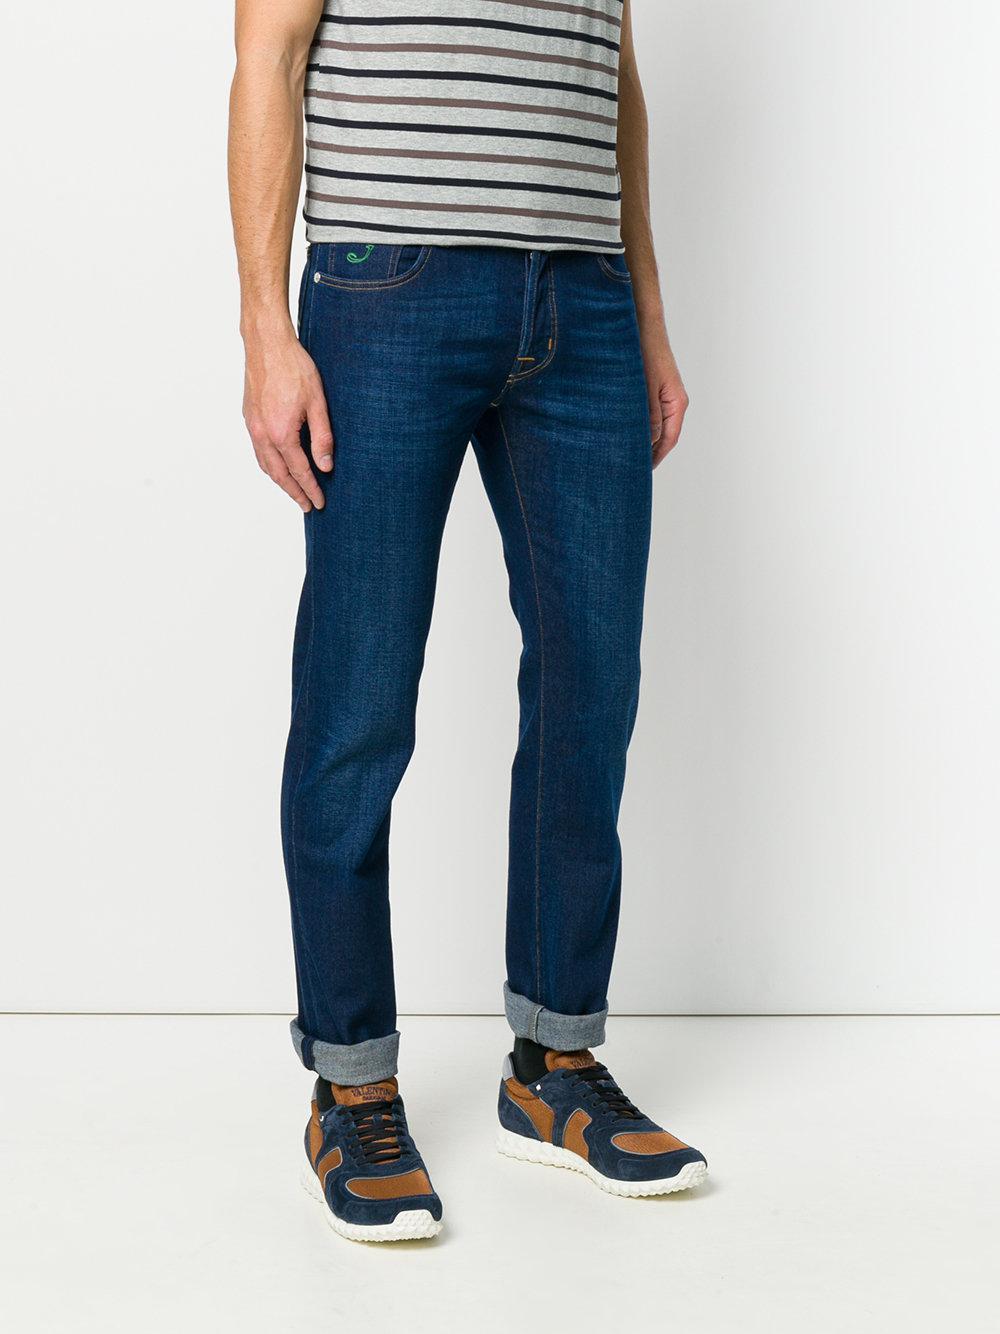 Jacob Cohen Denim Stonewashed Straight Leg Jeans in Blue for Men